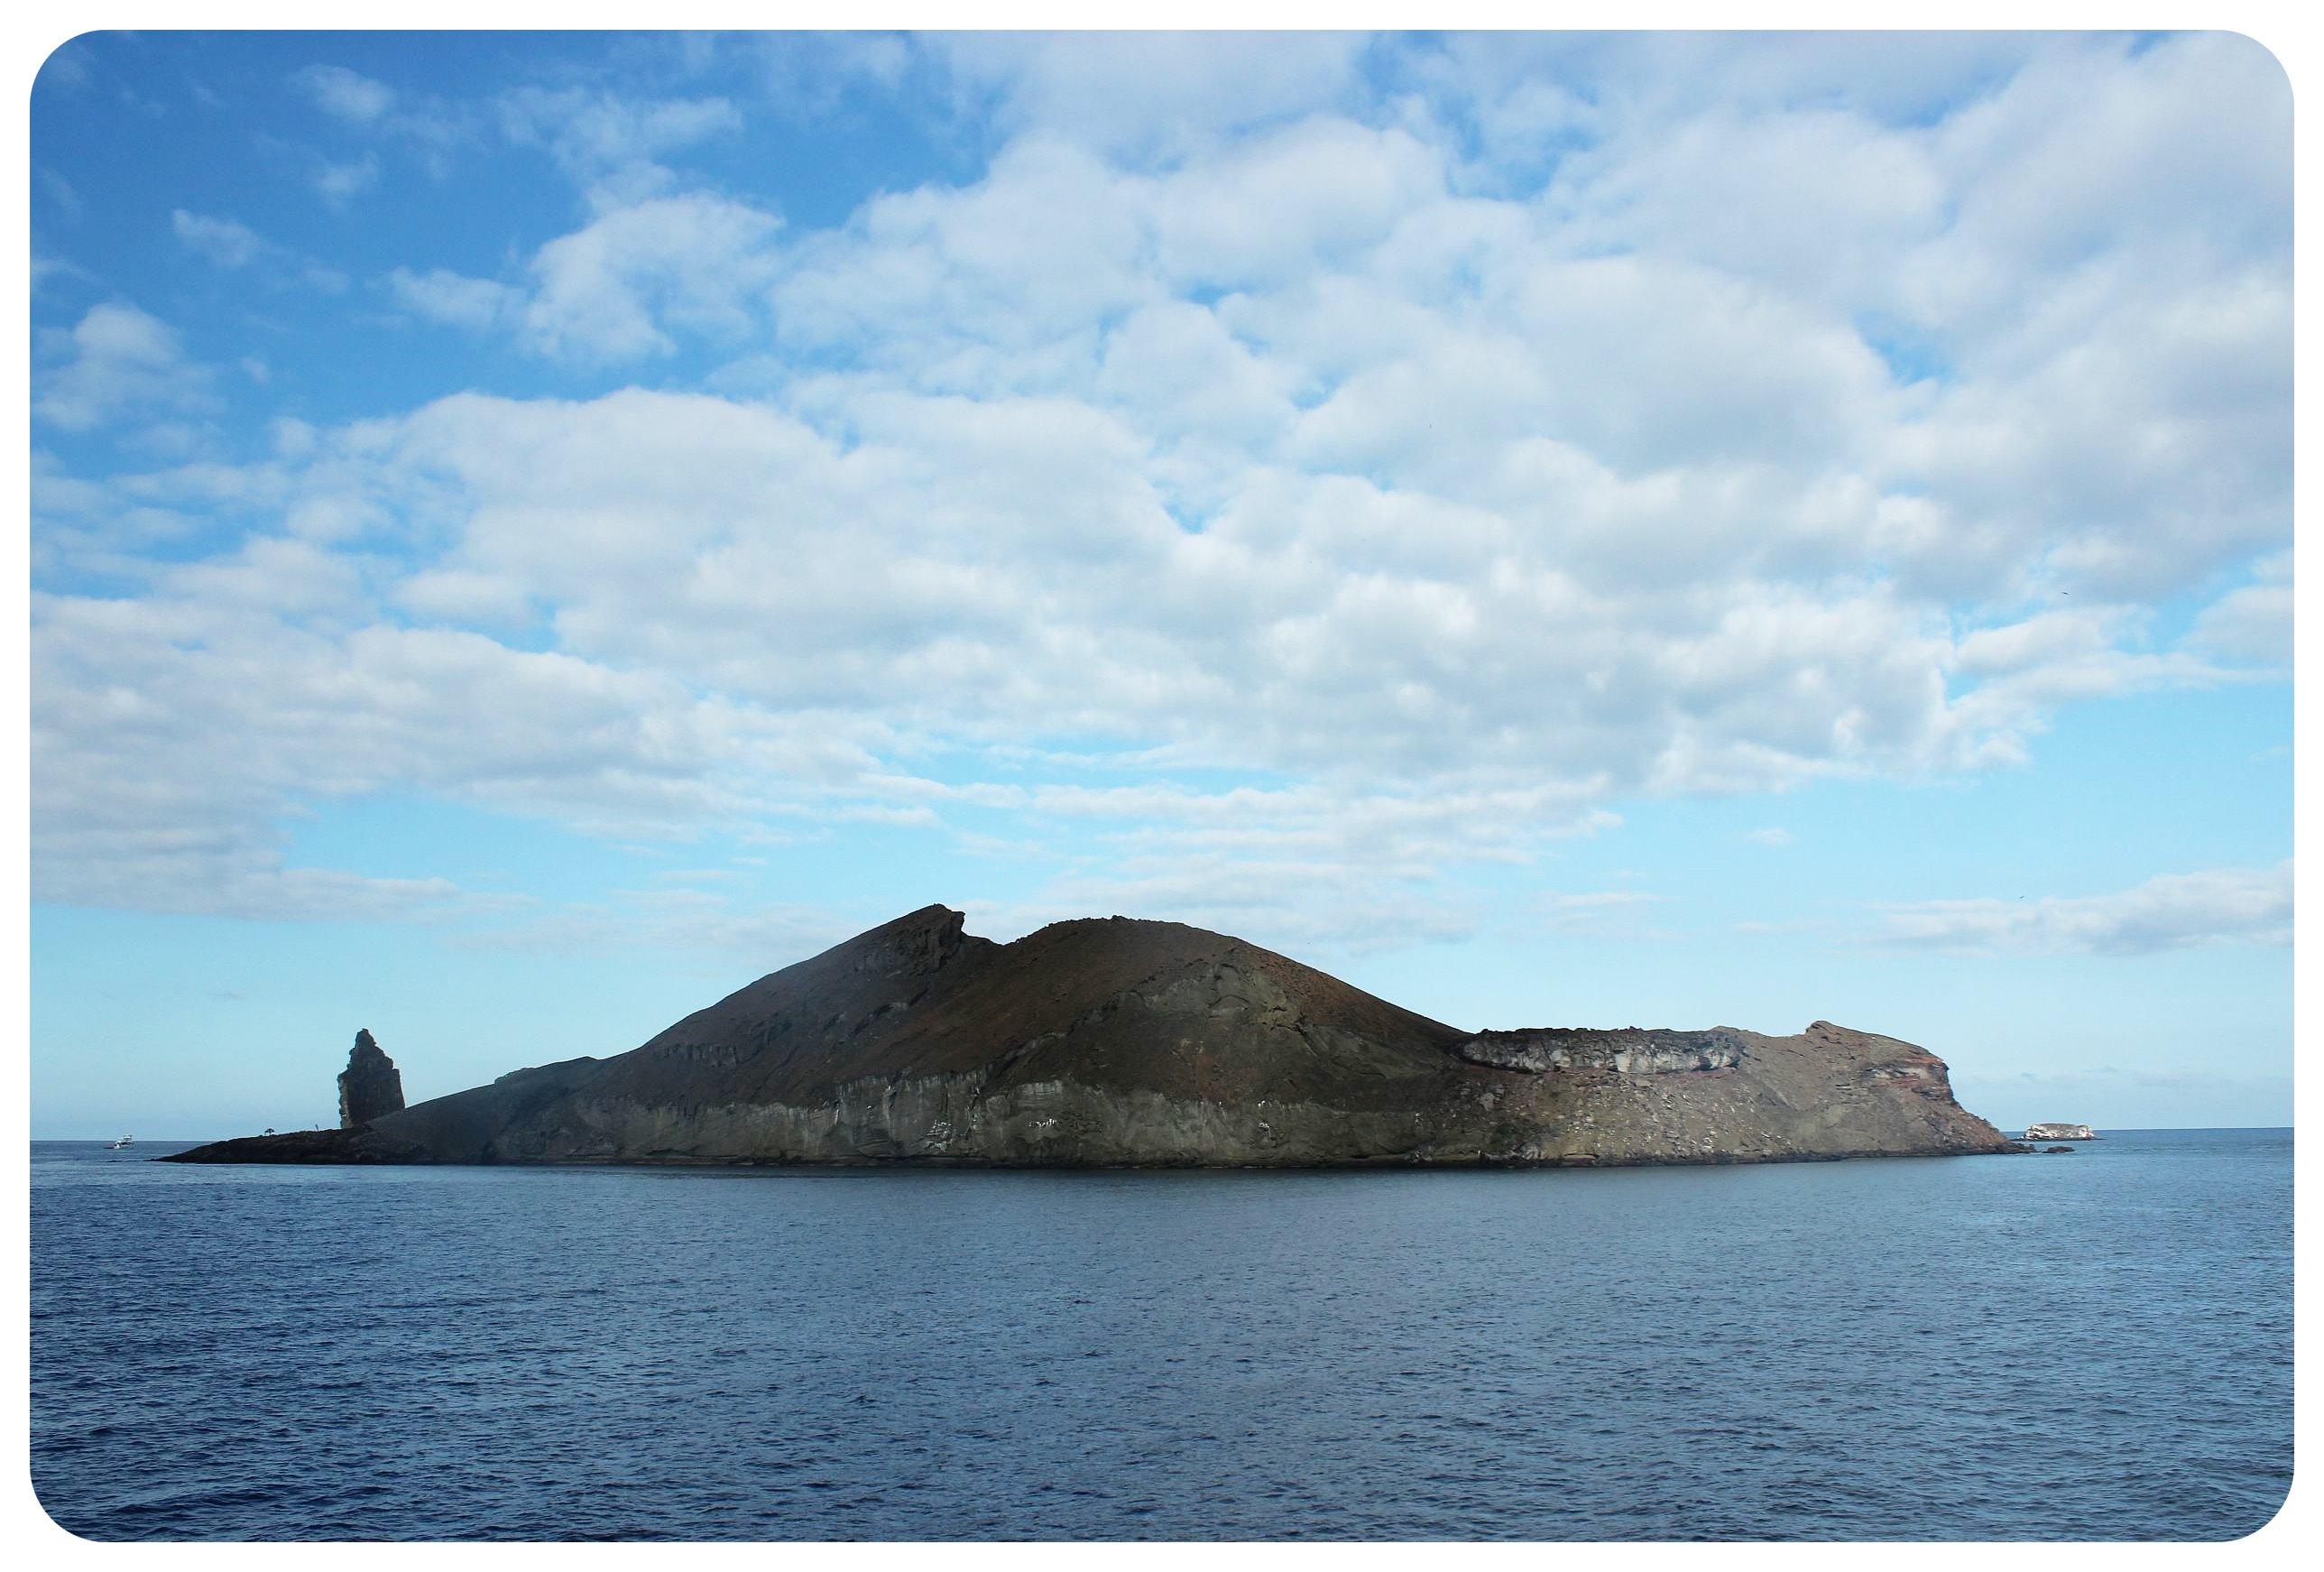 galapagos island rock